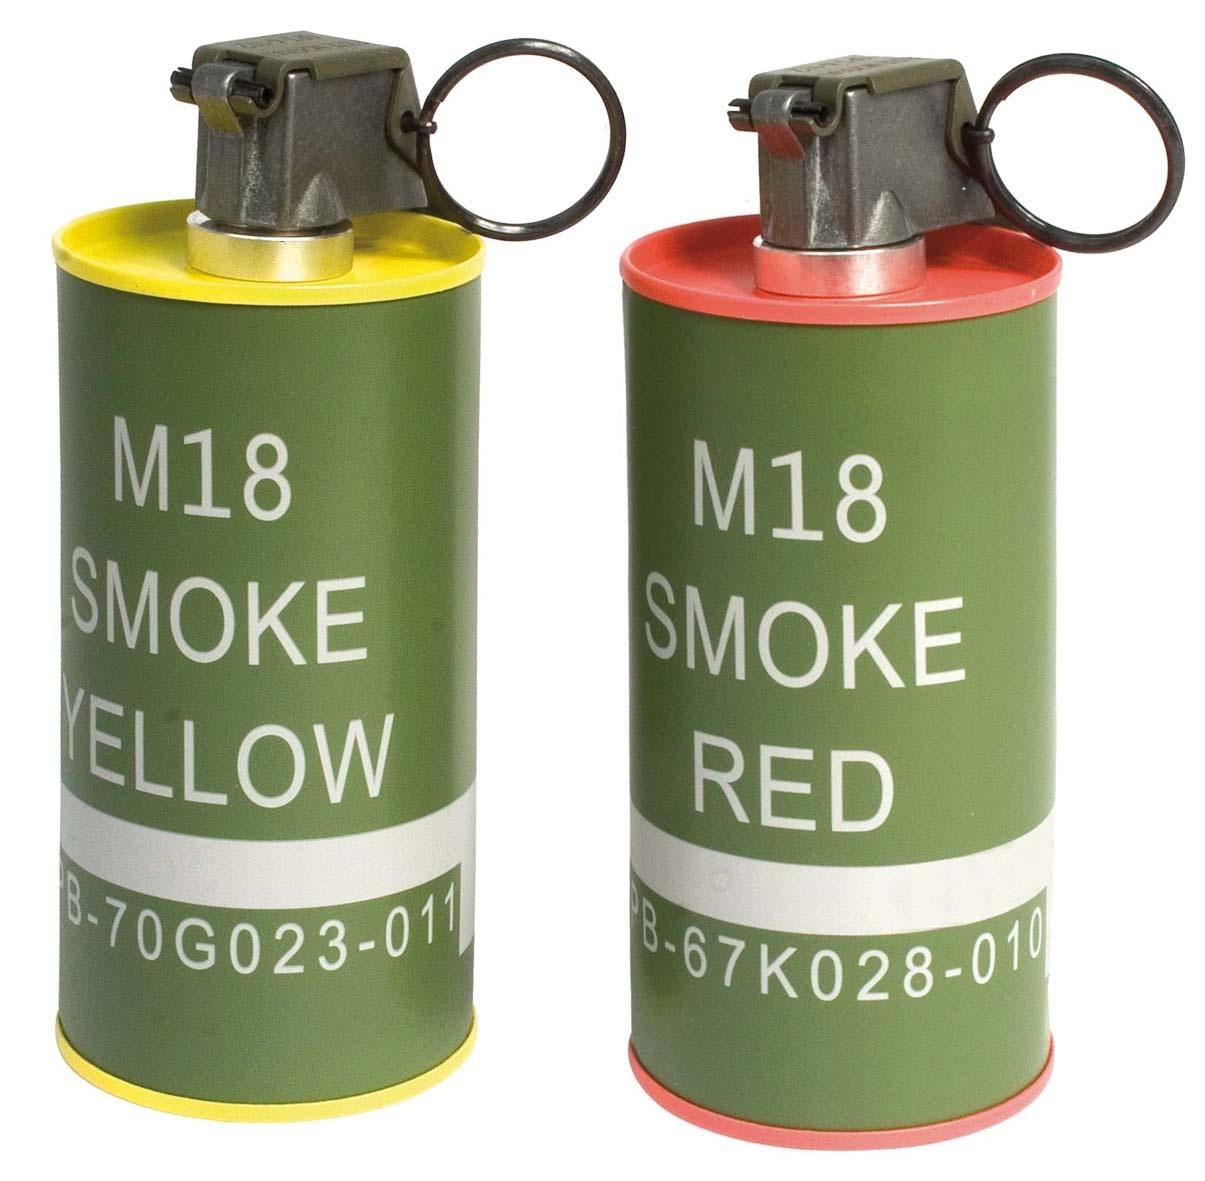 G&G M18 dummy smoke grenade set - 2 pieces